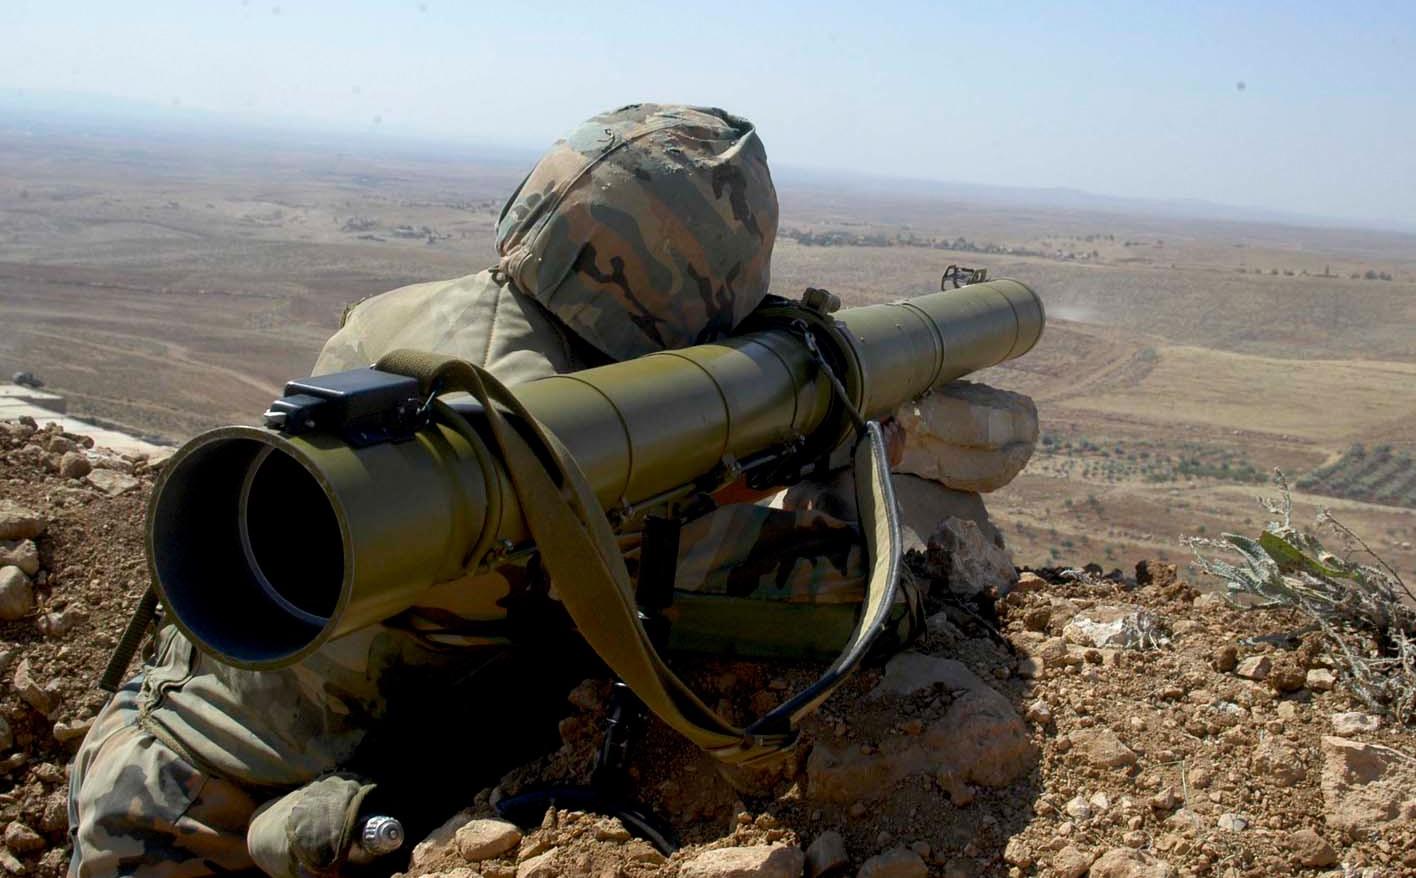 Hayat Tahrir al-Sham Fails To Overrun Syrian Army Positions In Northern Hama